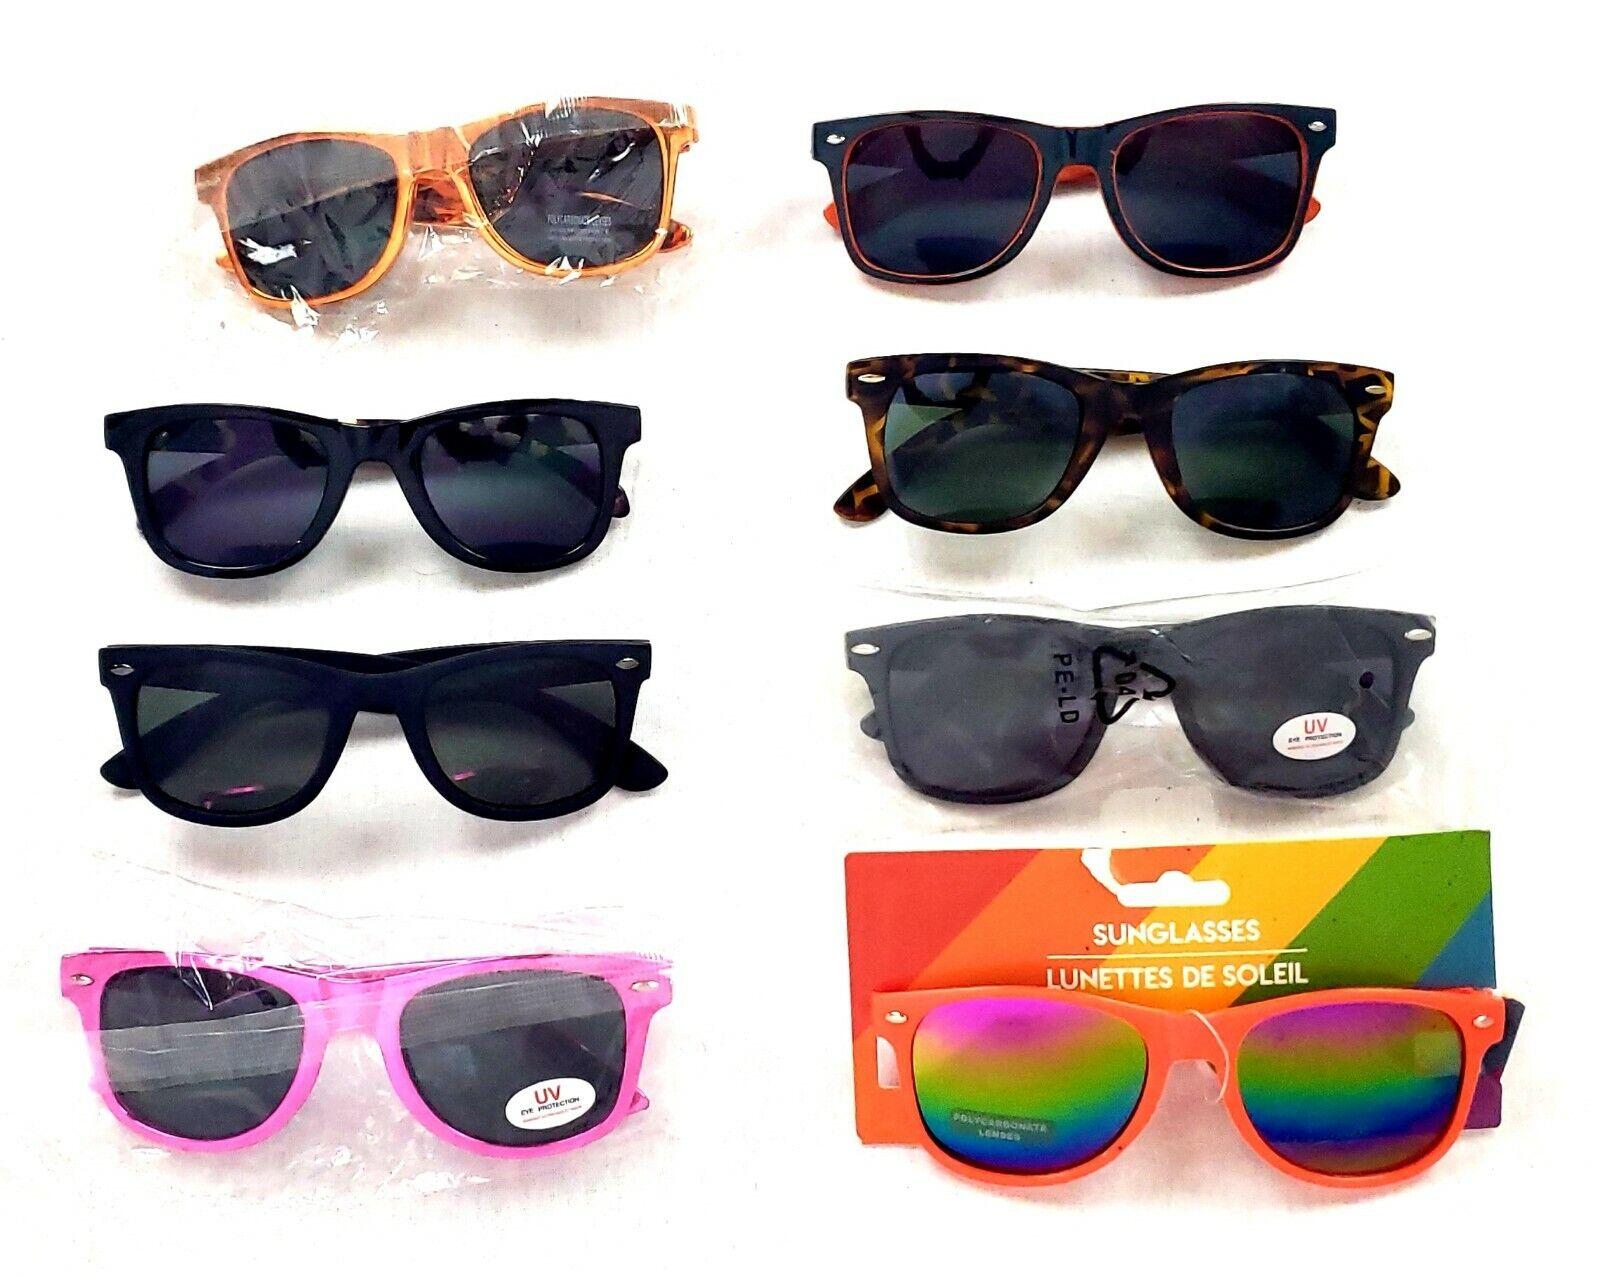 Adult Unisex Fashion Sunglasses Lot Of 8 Assorted Wayfare Style & Color/Designs